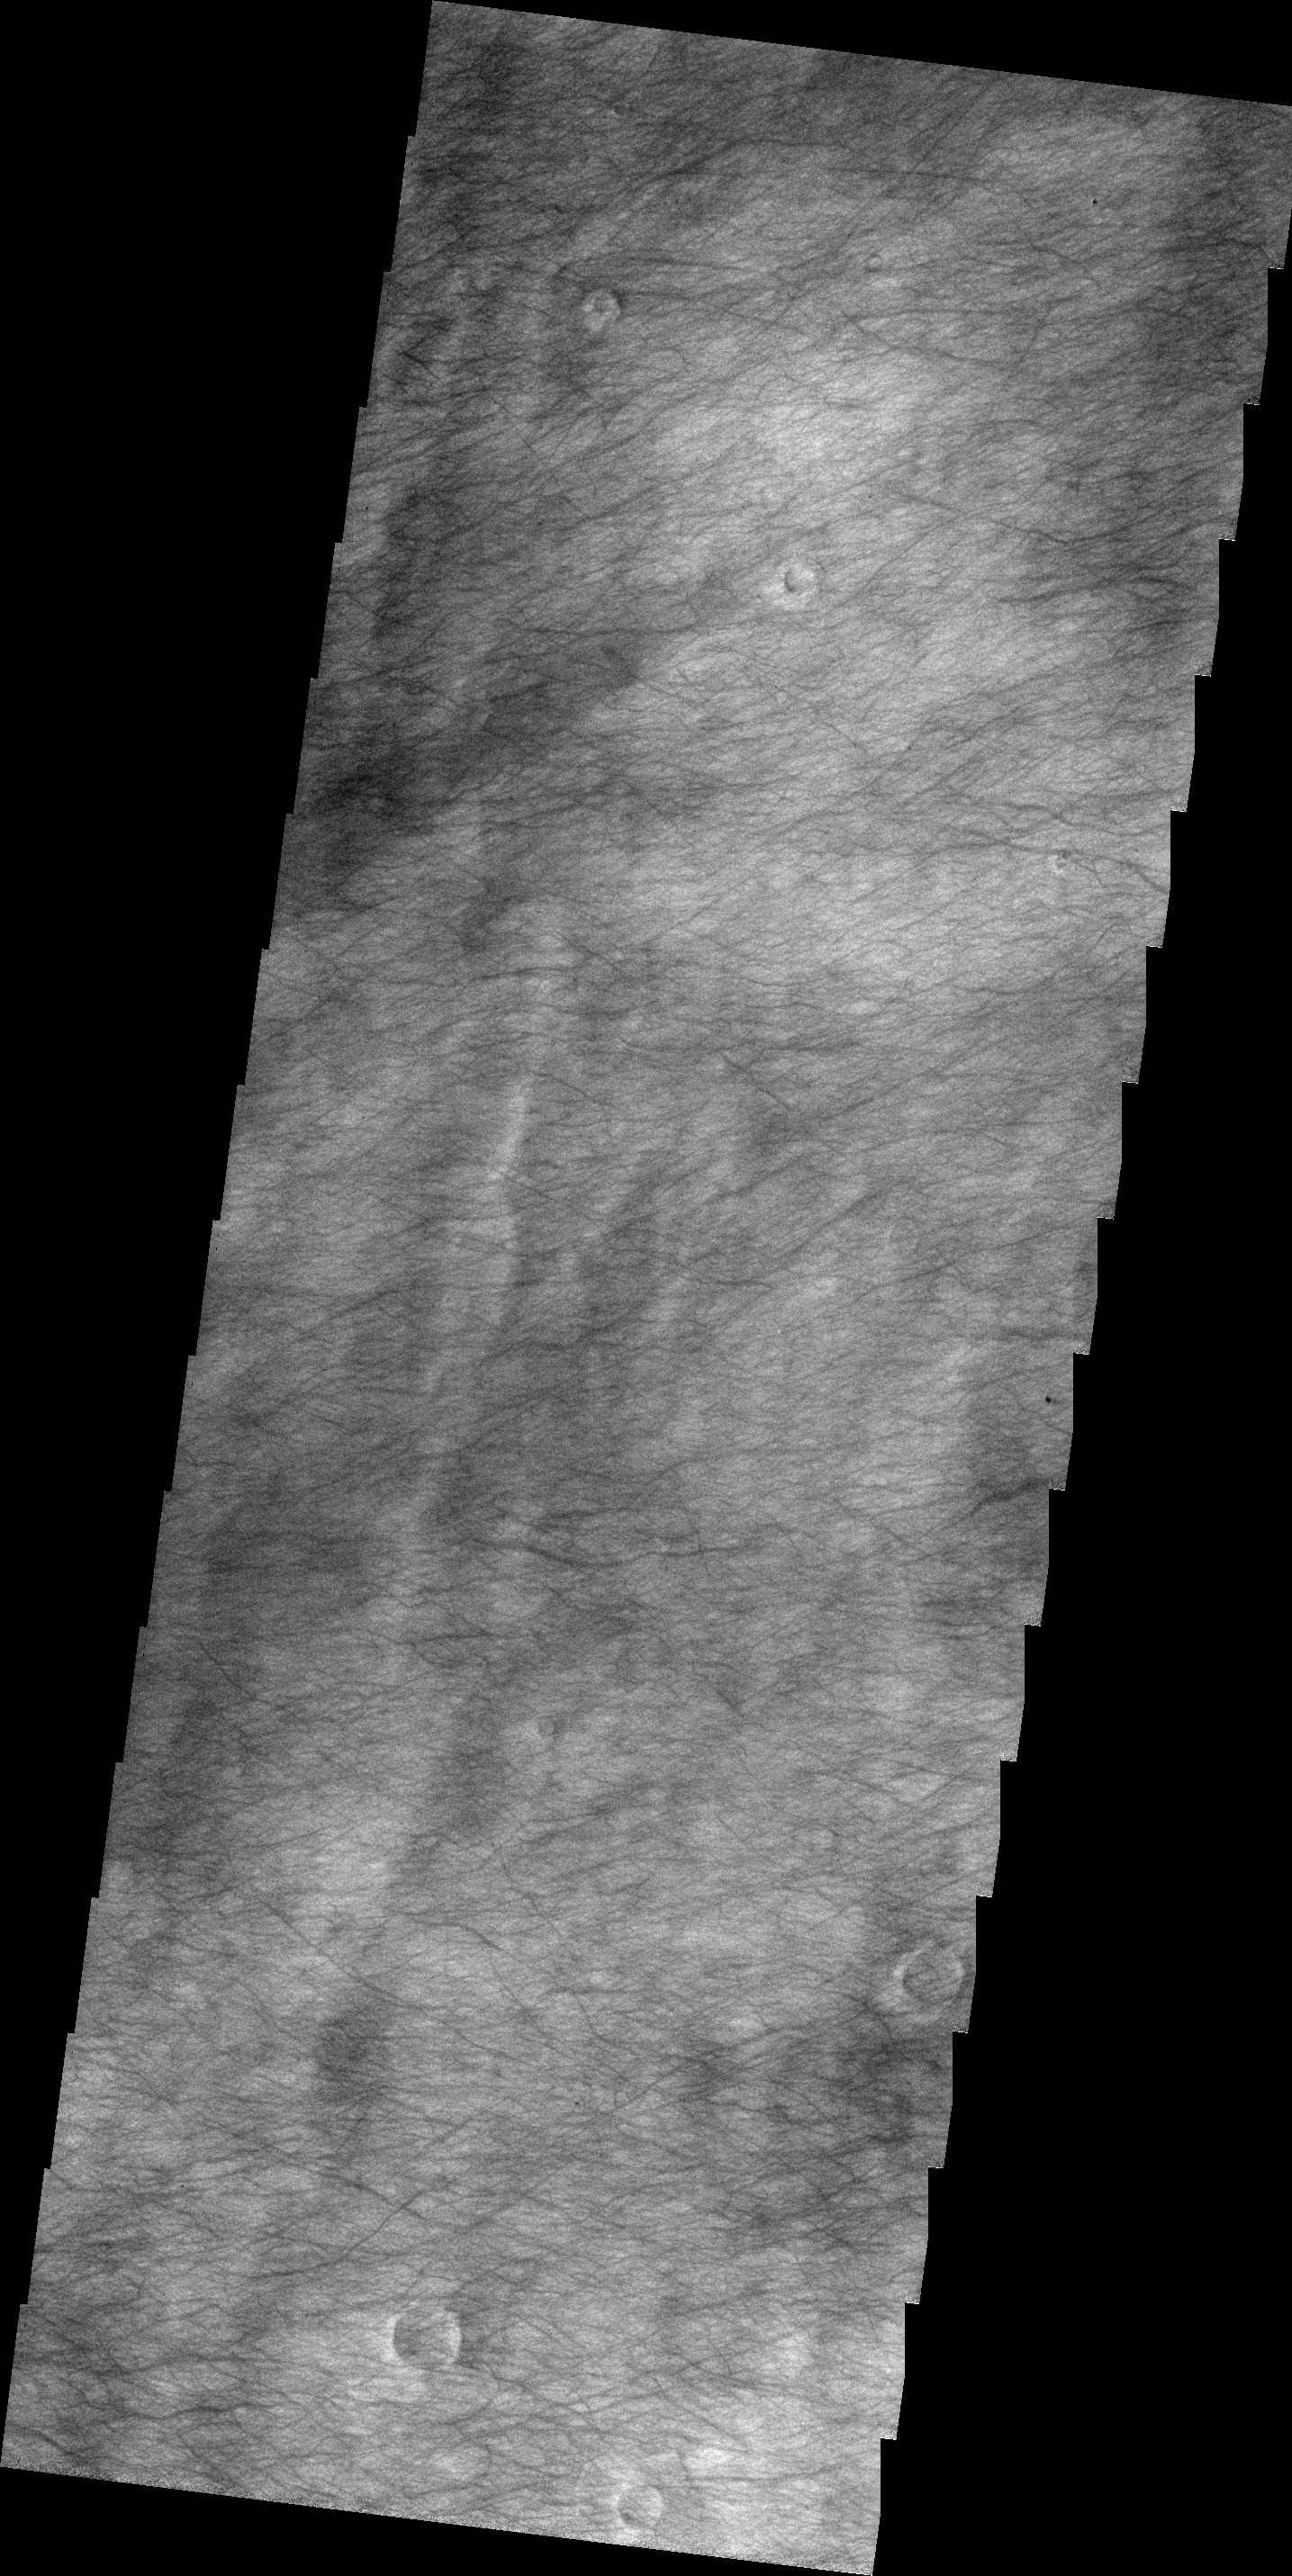 dust tracks on a road pdf